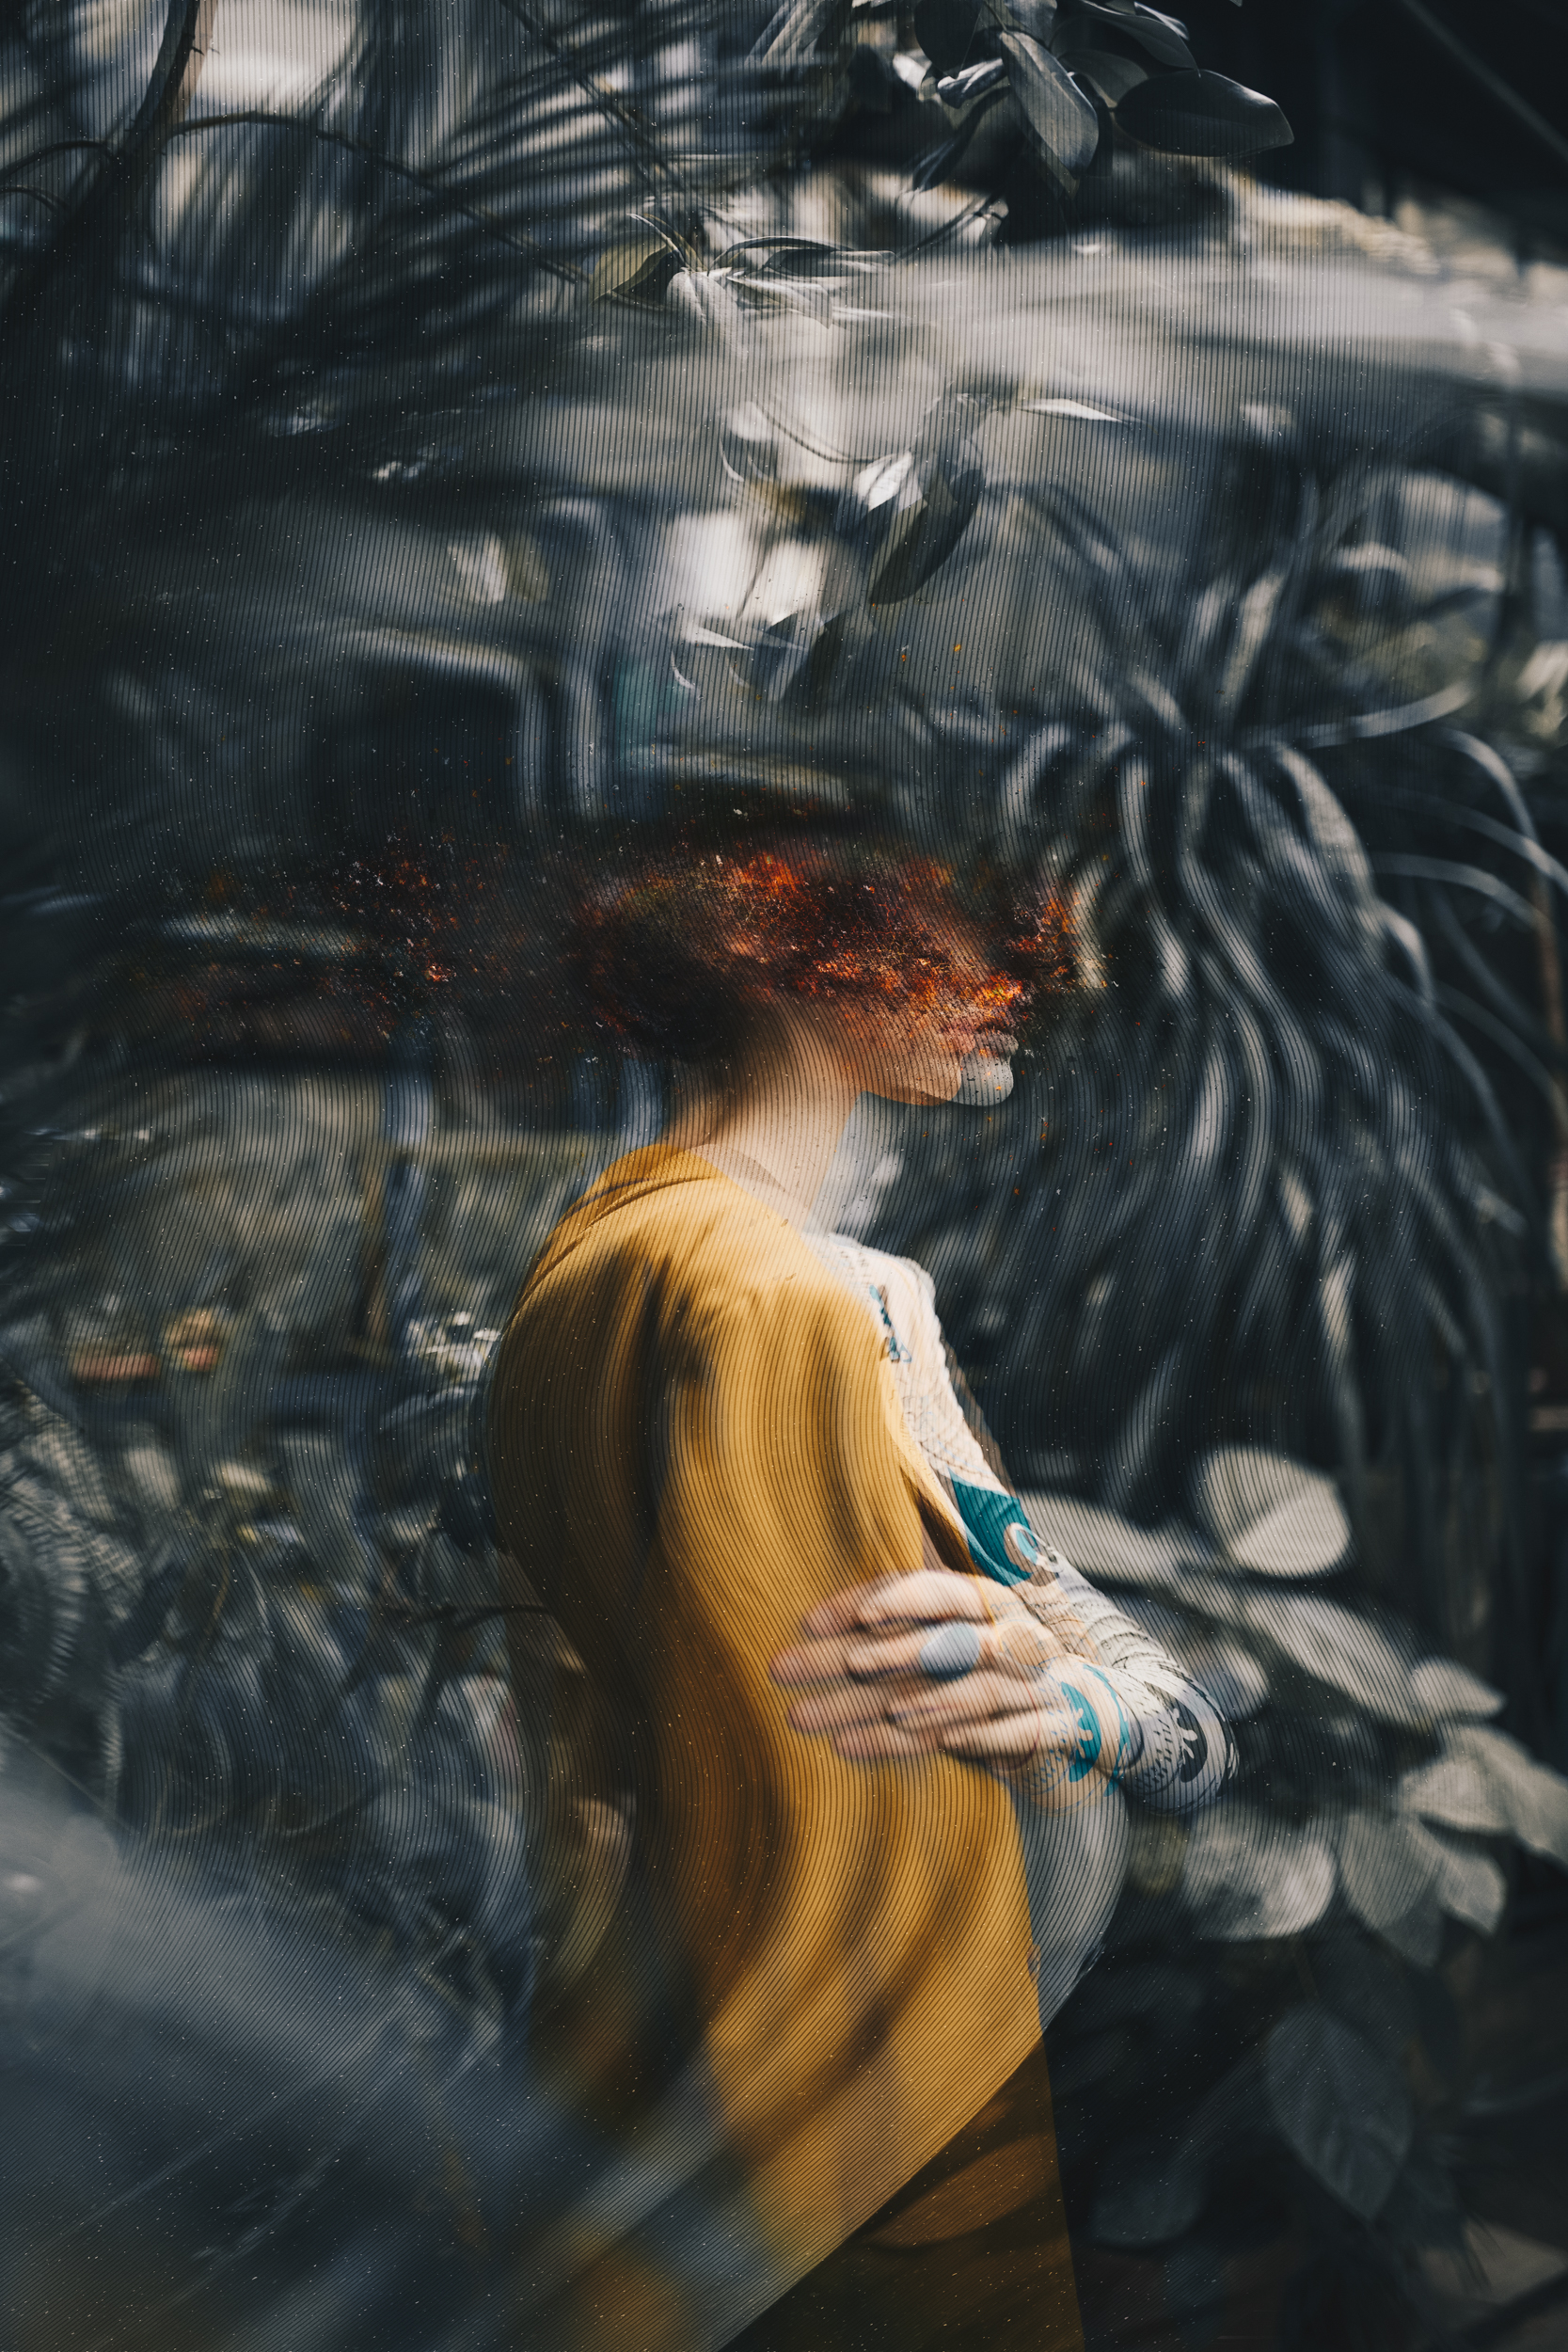 distorted combustion - portrait